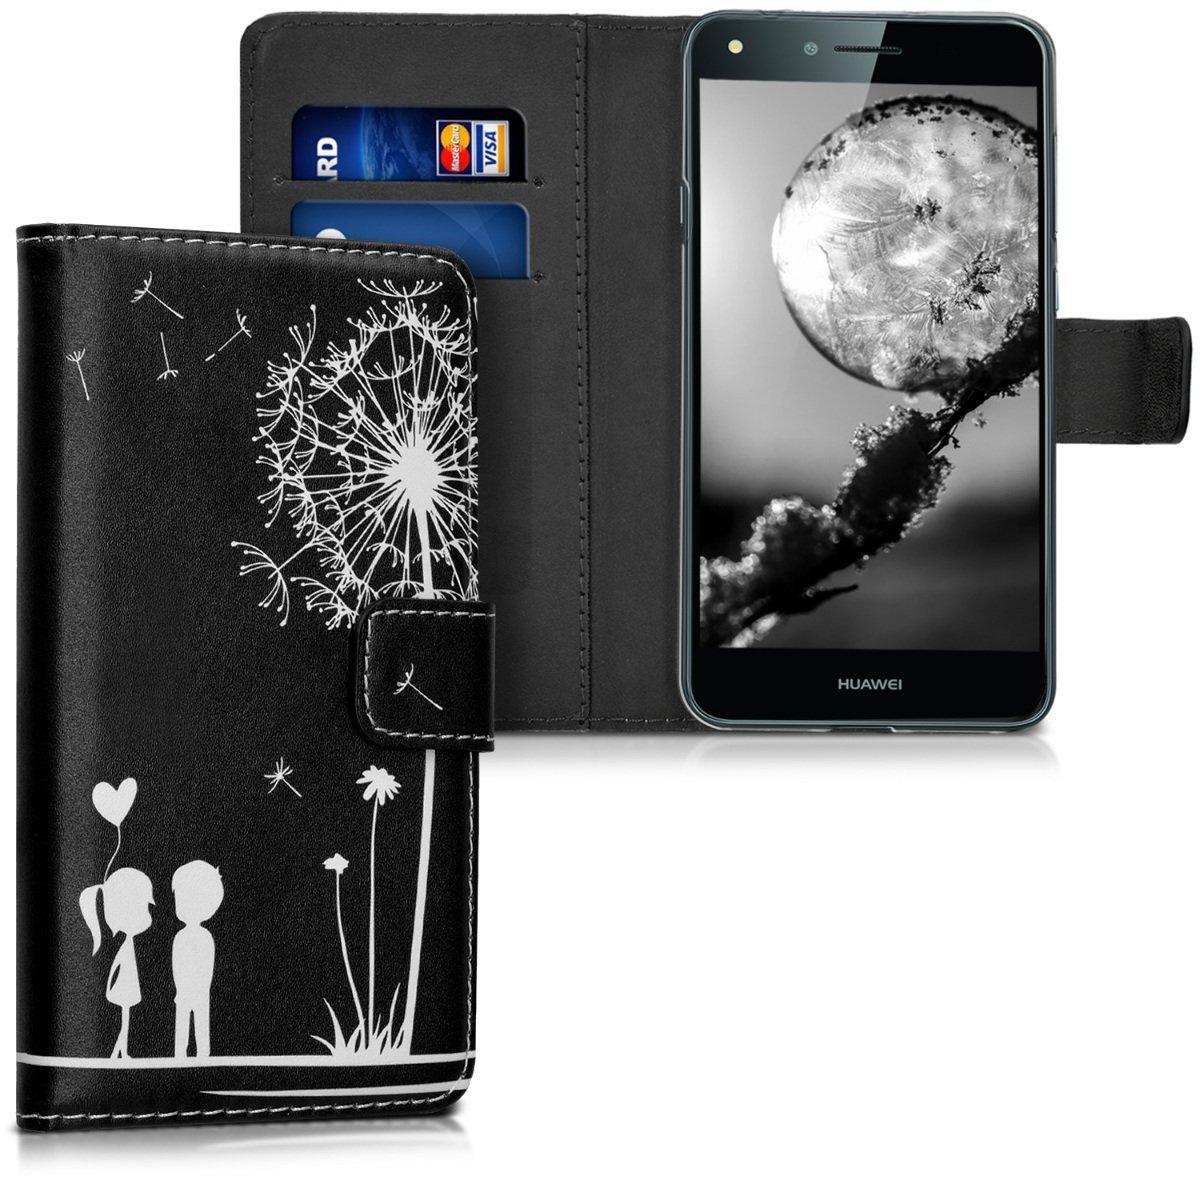 KW Θήκη Πορτοφόλι Huawei Y6 II Compact - Dandelion Love (39893.03)